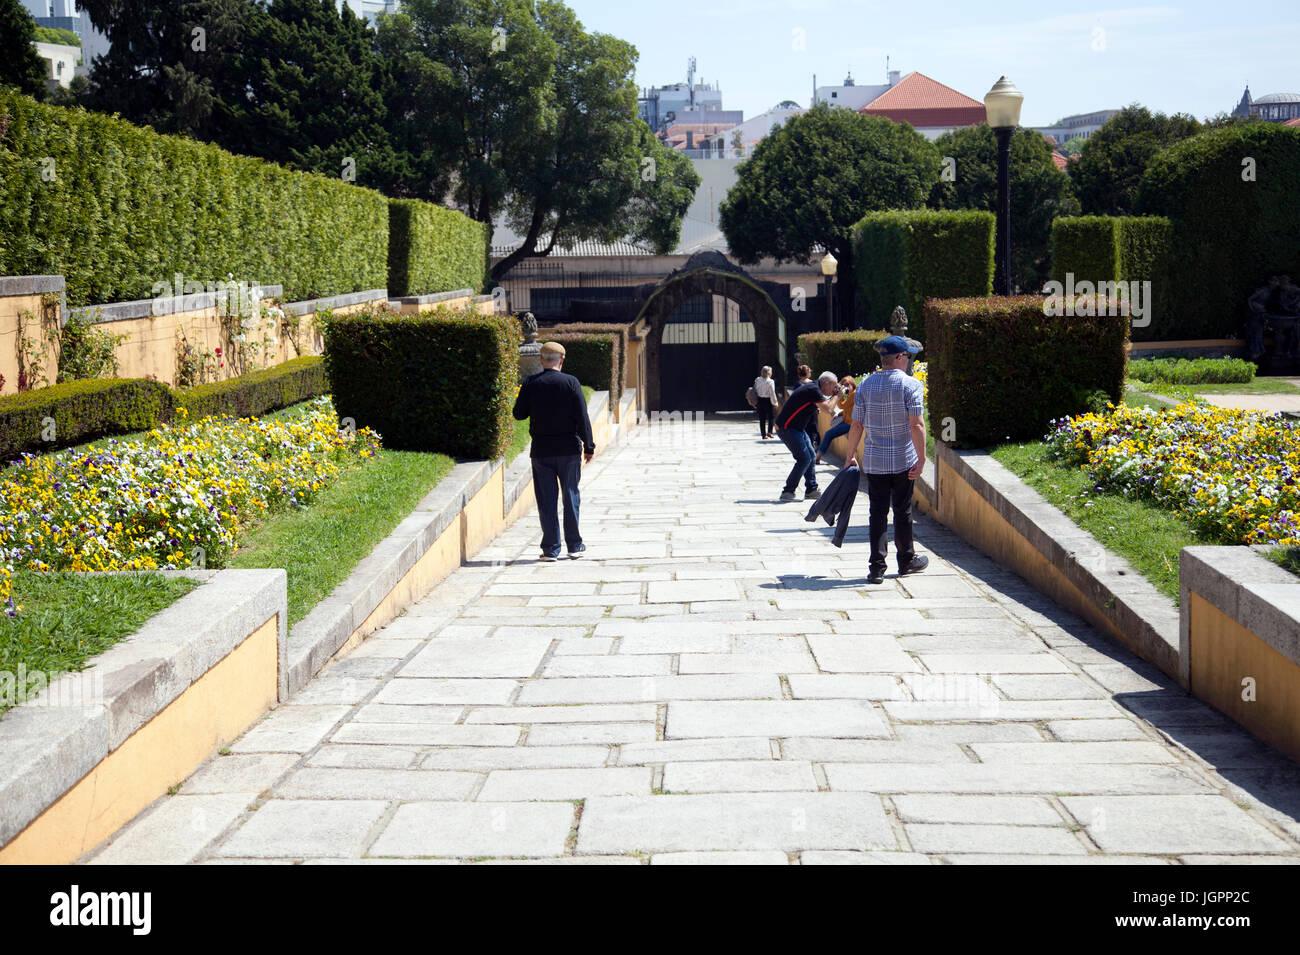 Palacio de Cristal Gardens in Porto - Portugal - Stock Image